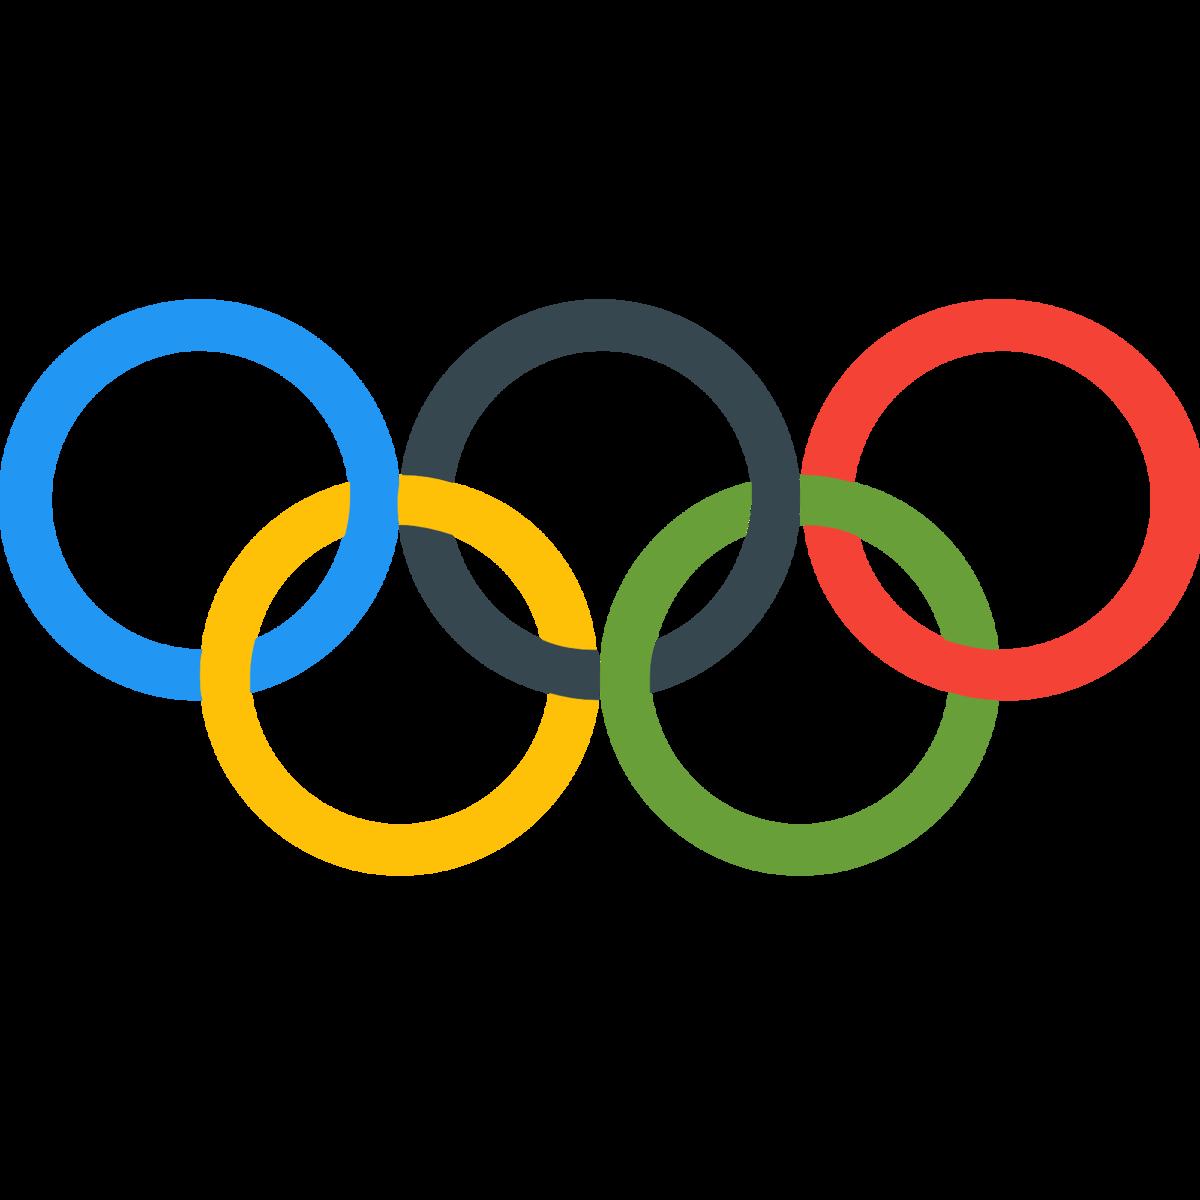 Картинка с логотипом олимпийских игр